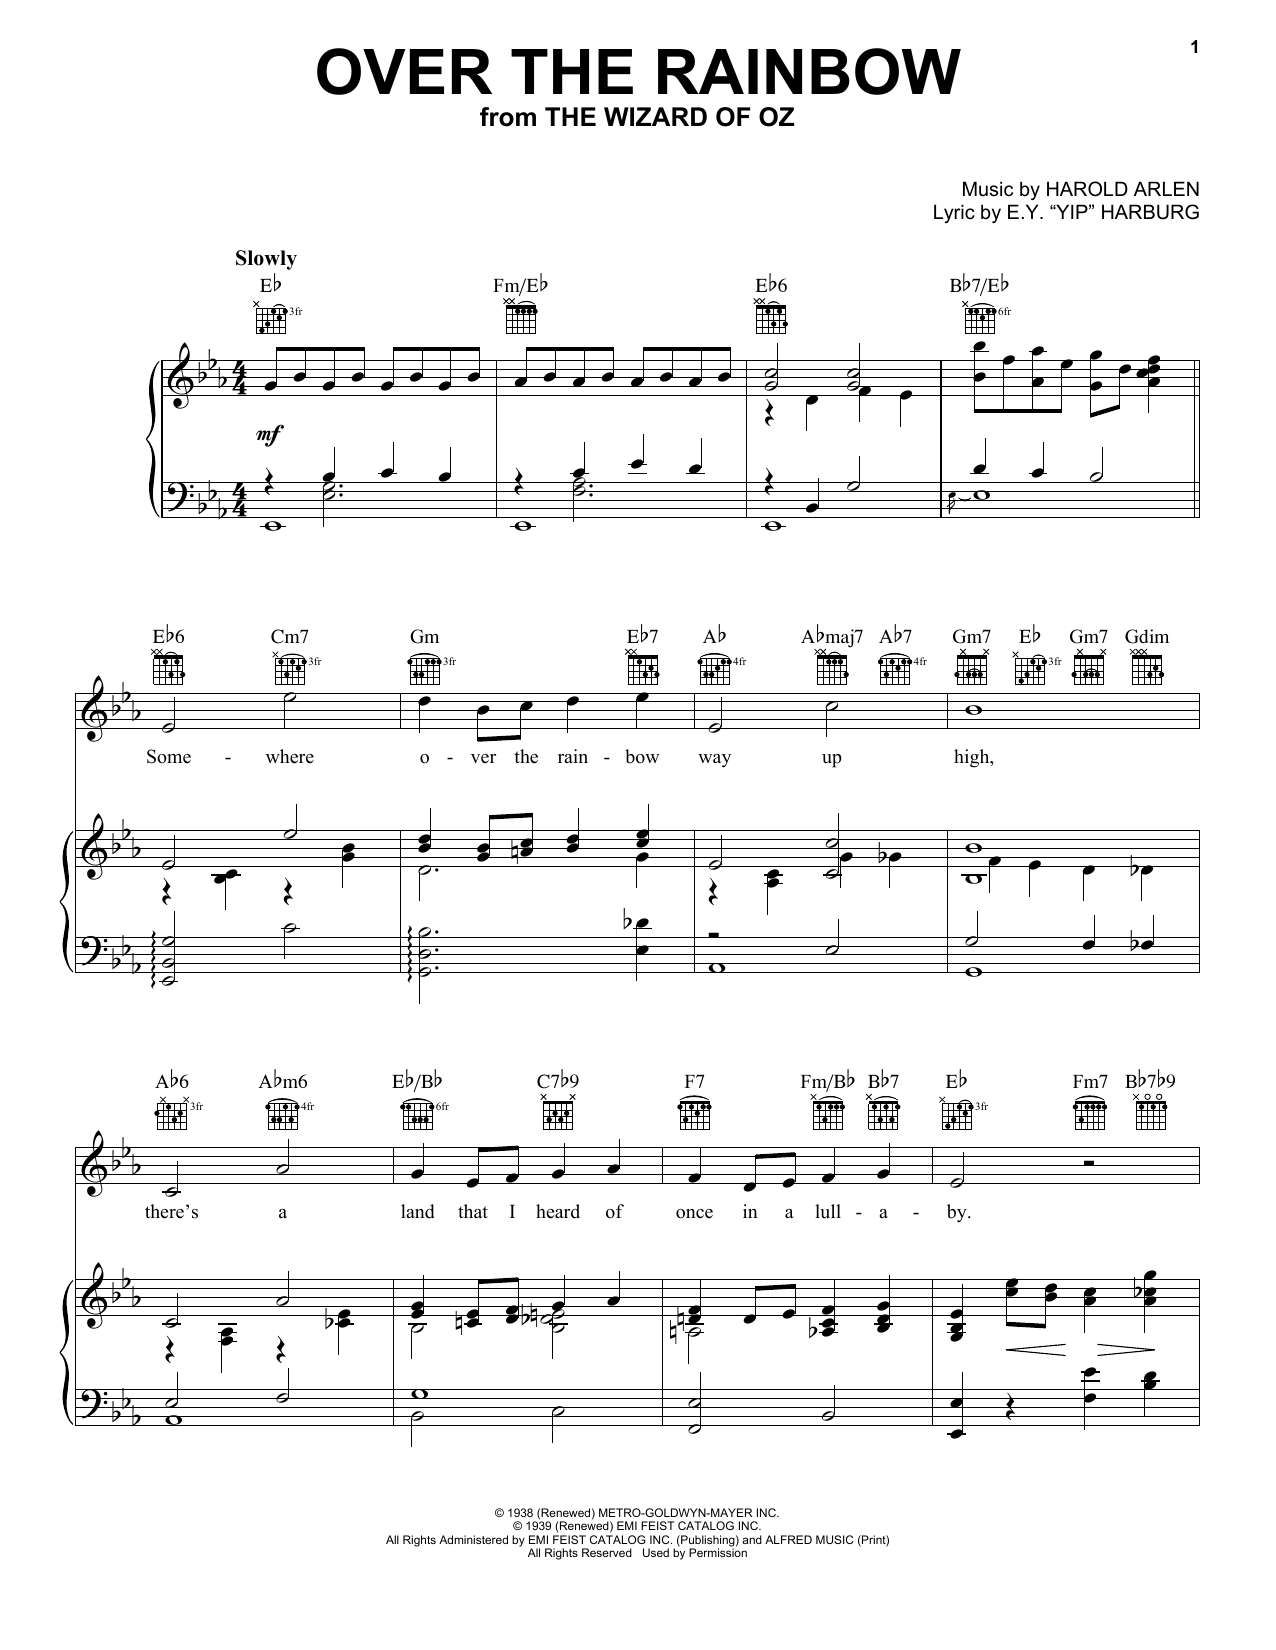 Over The Rainbow sheet music